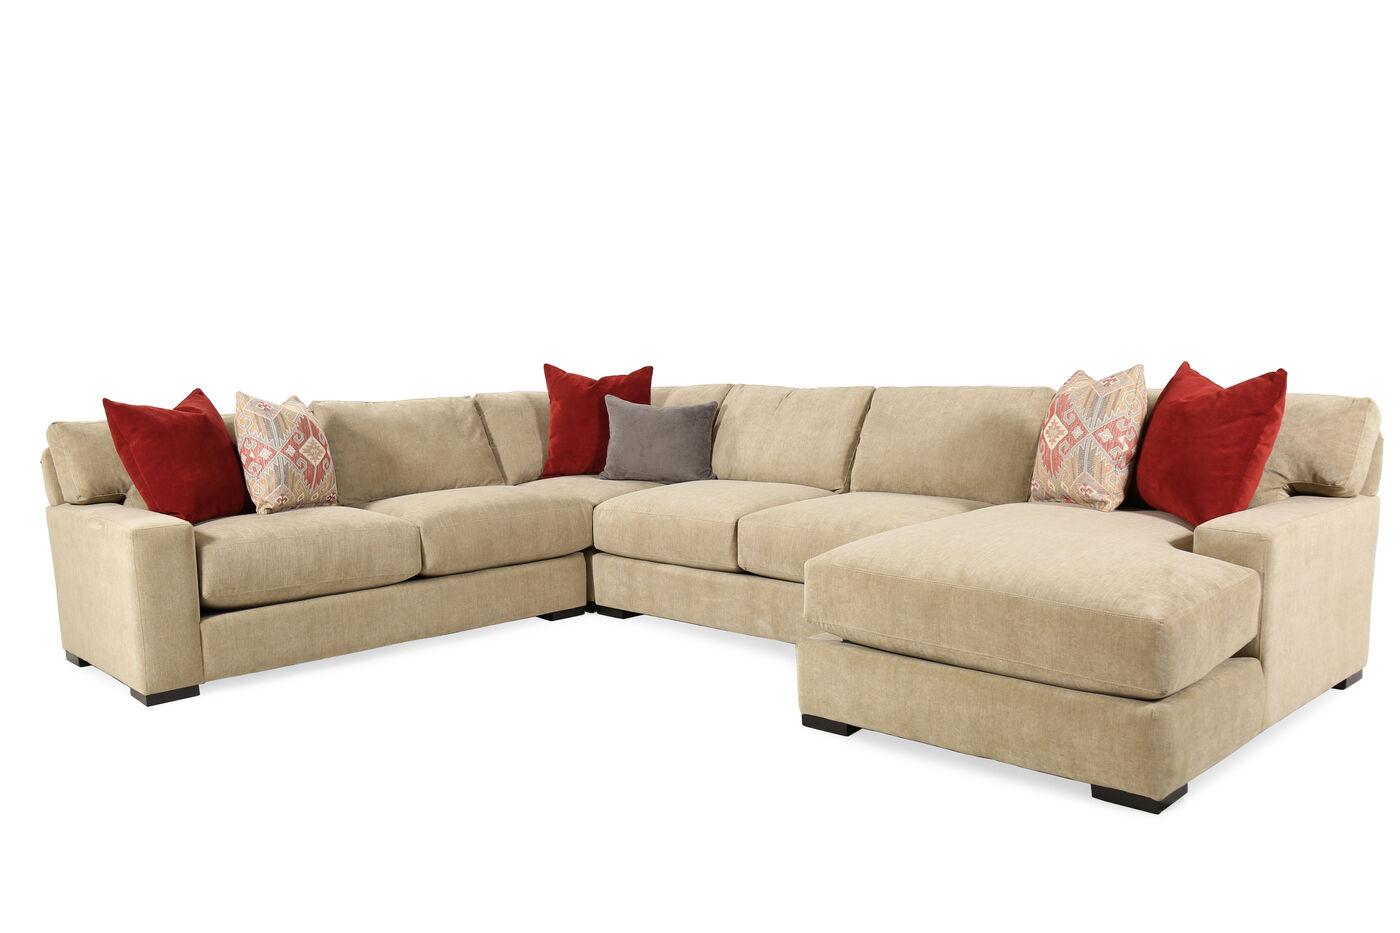 Lazy Boy Reclining Sofa Back Removal Recliner Design